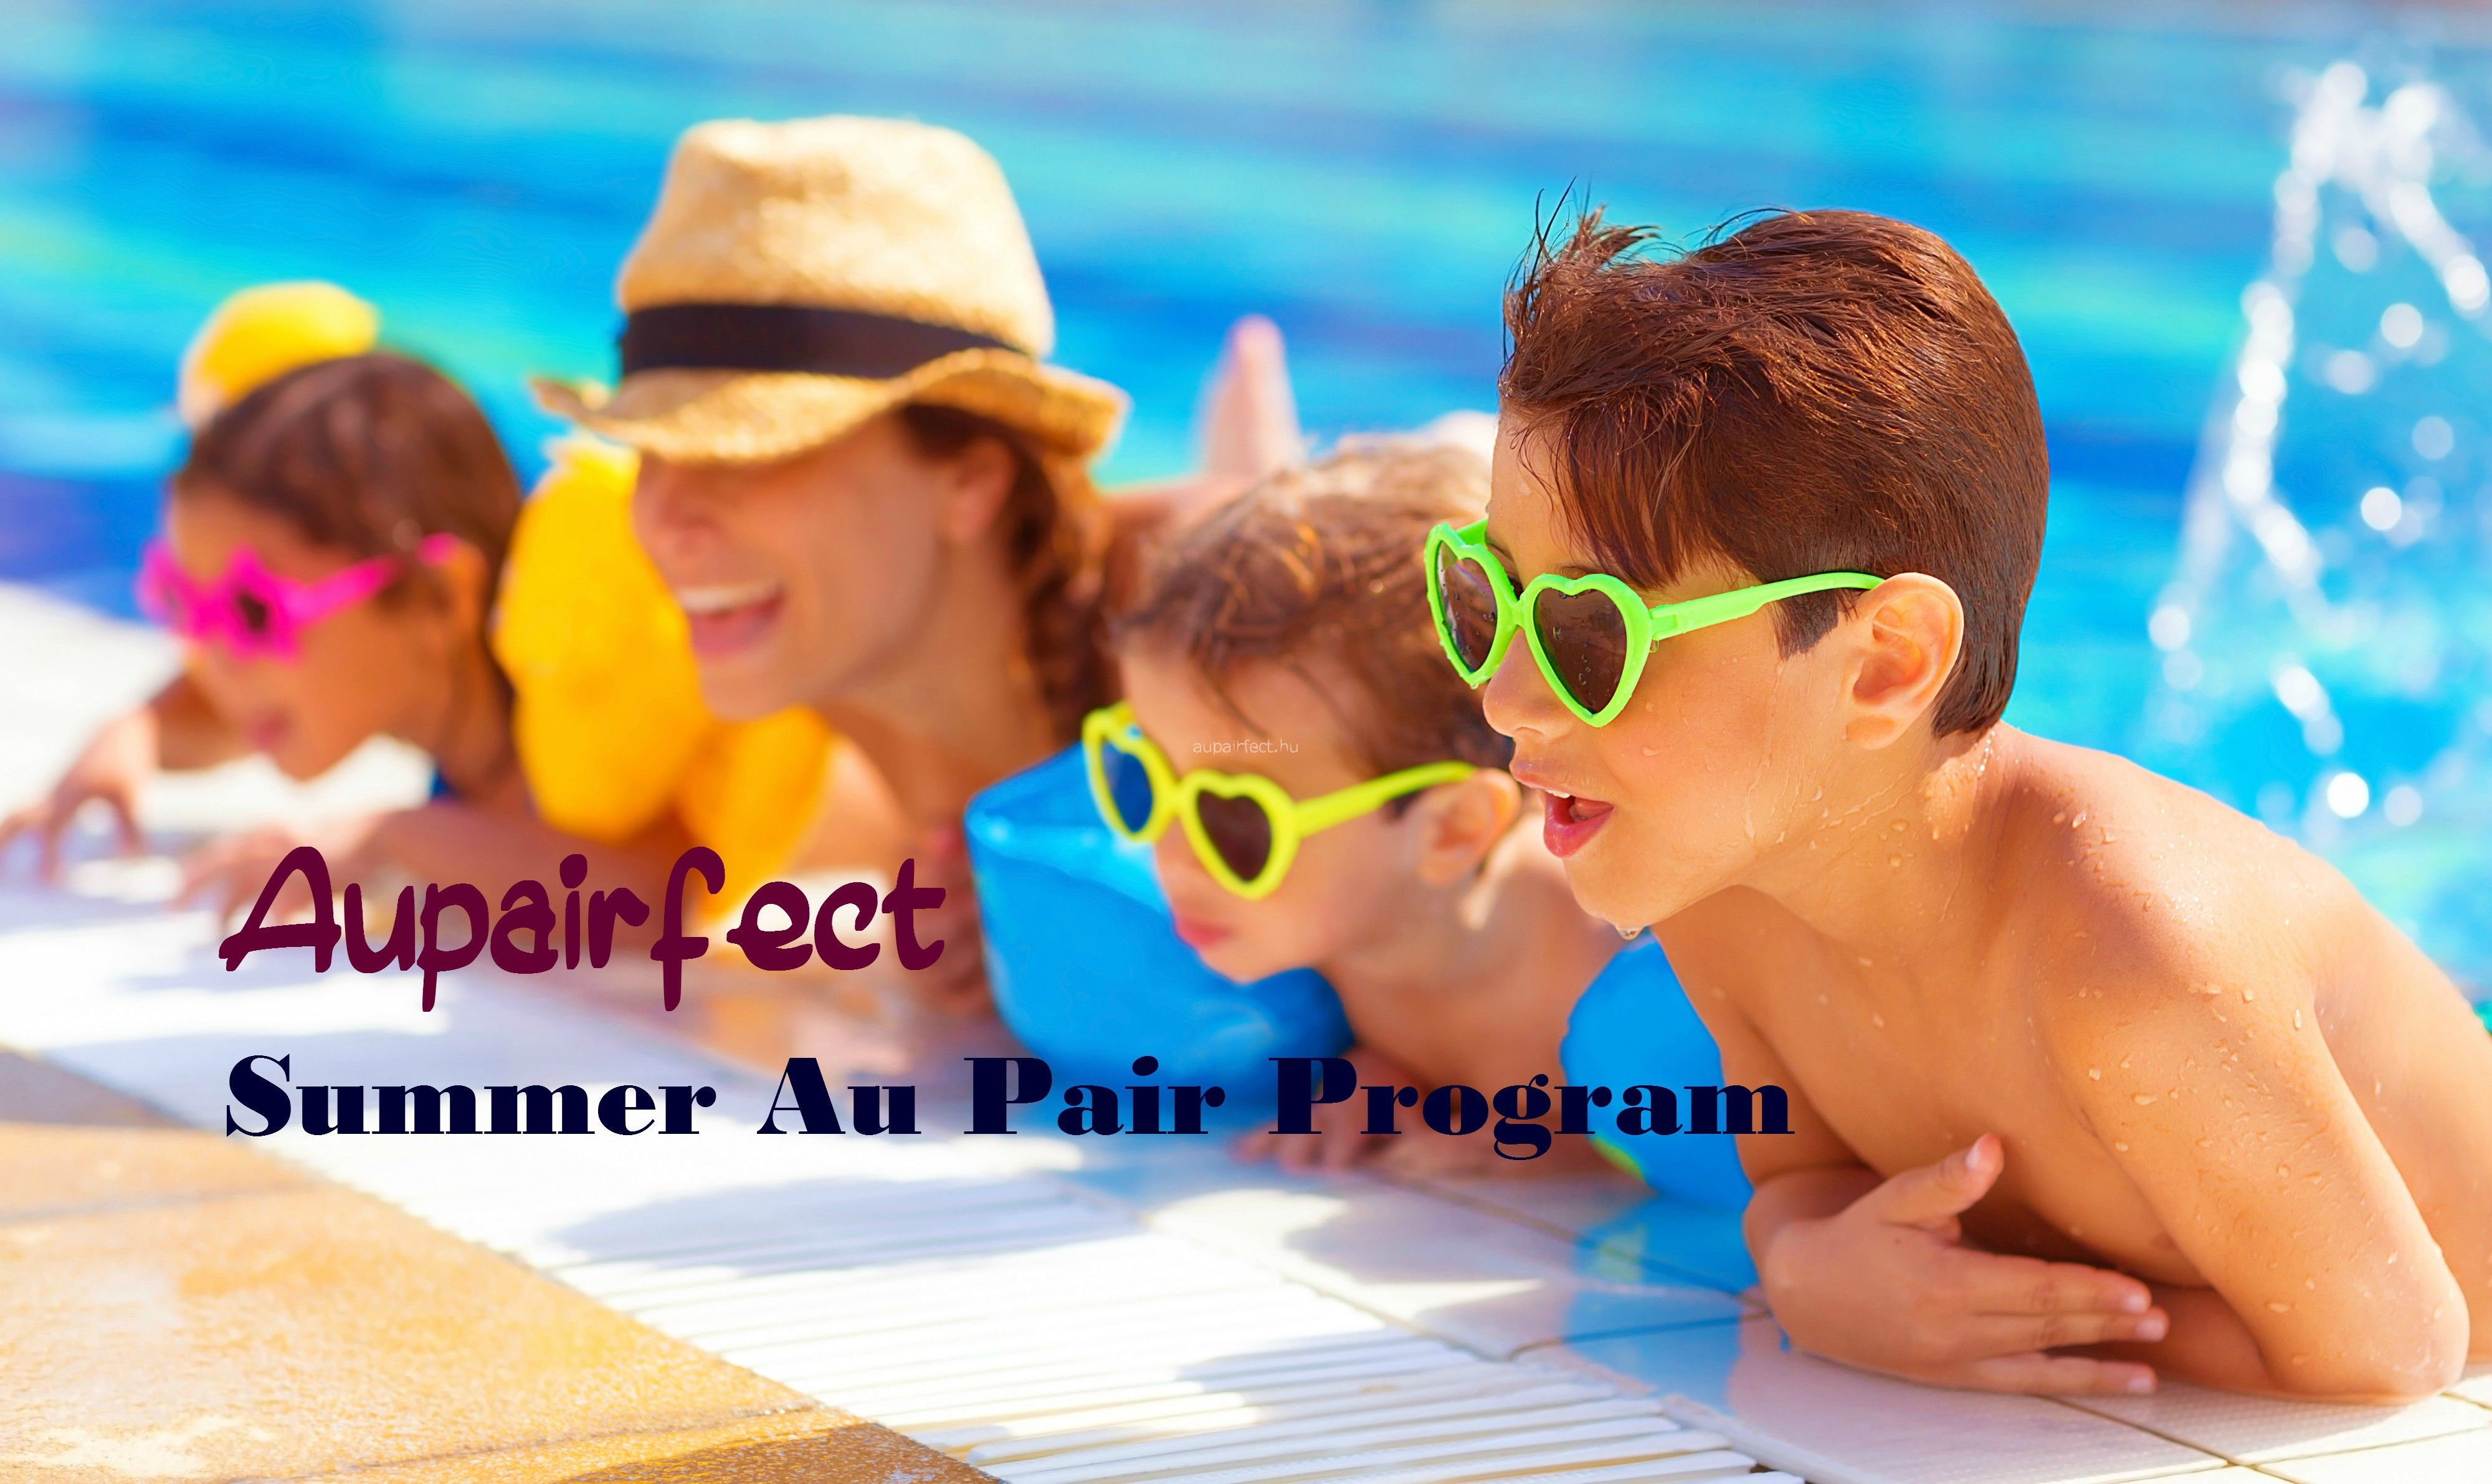 5 érv, amiért érdemes Summer au pair munkát vállalnod